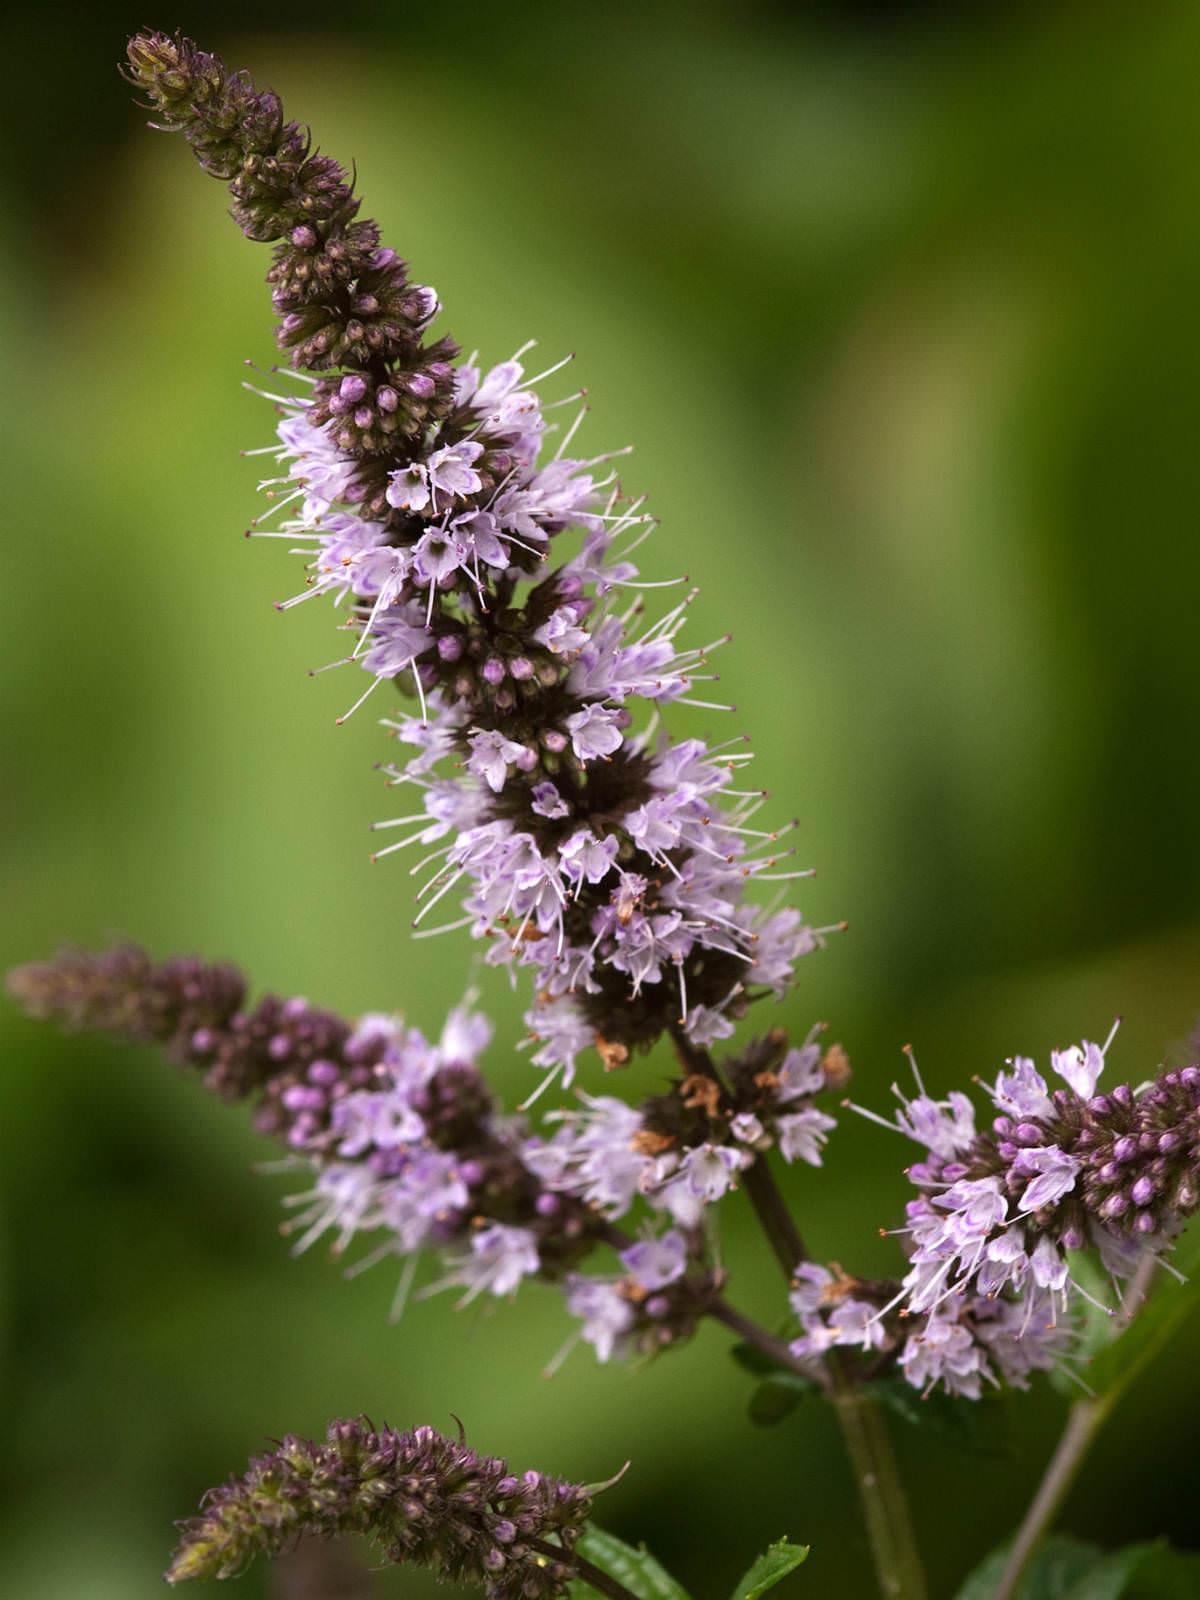 Mentha × piperita - Peppermint | World of Flowering Plants